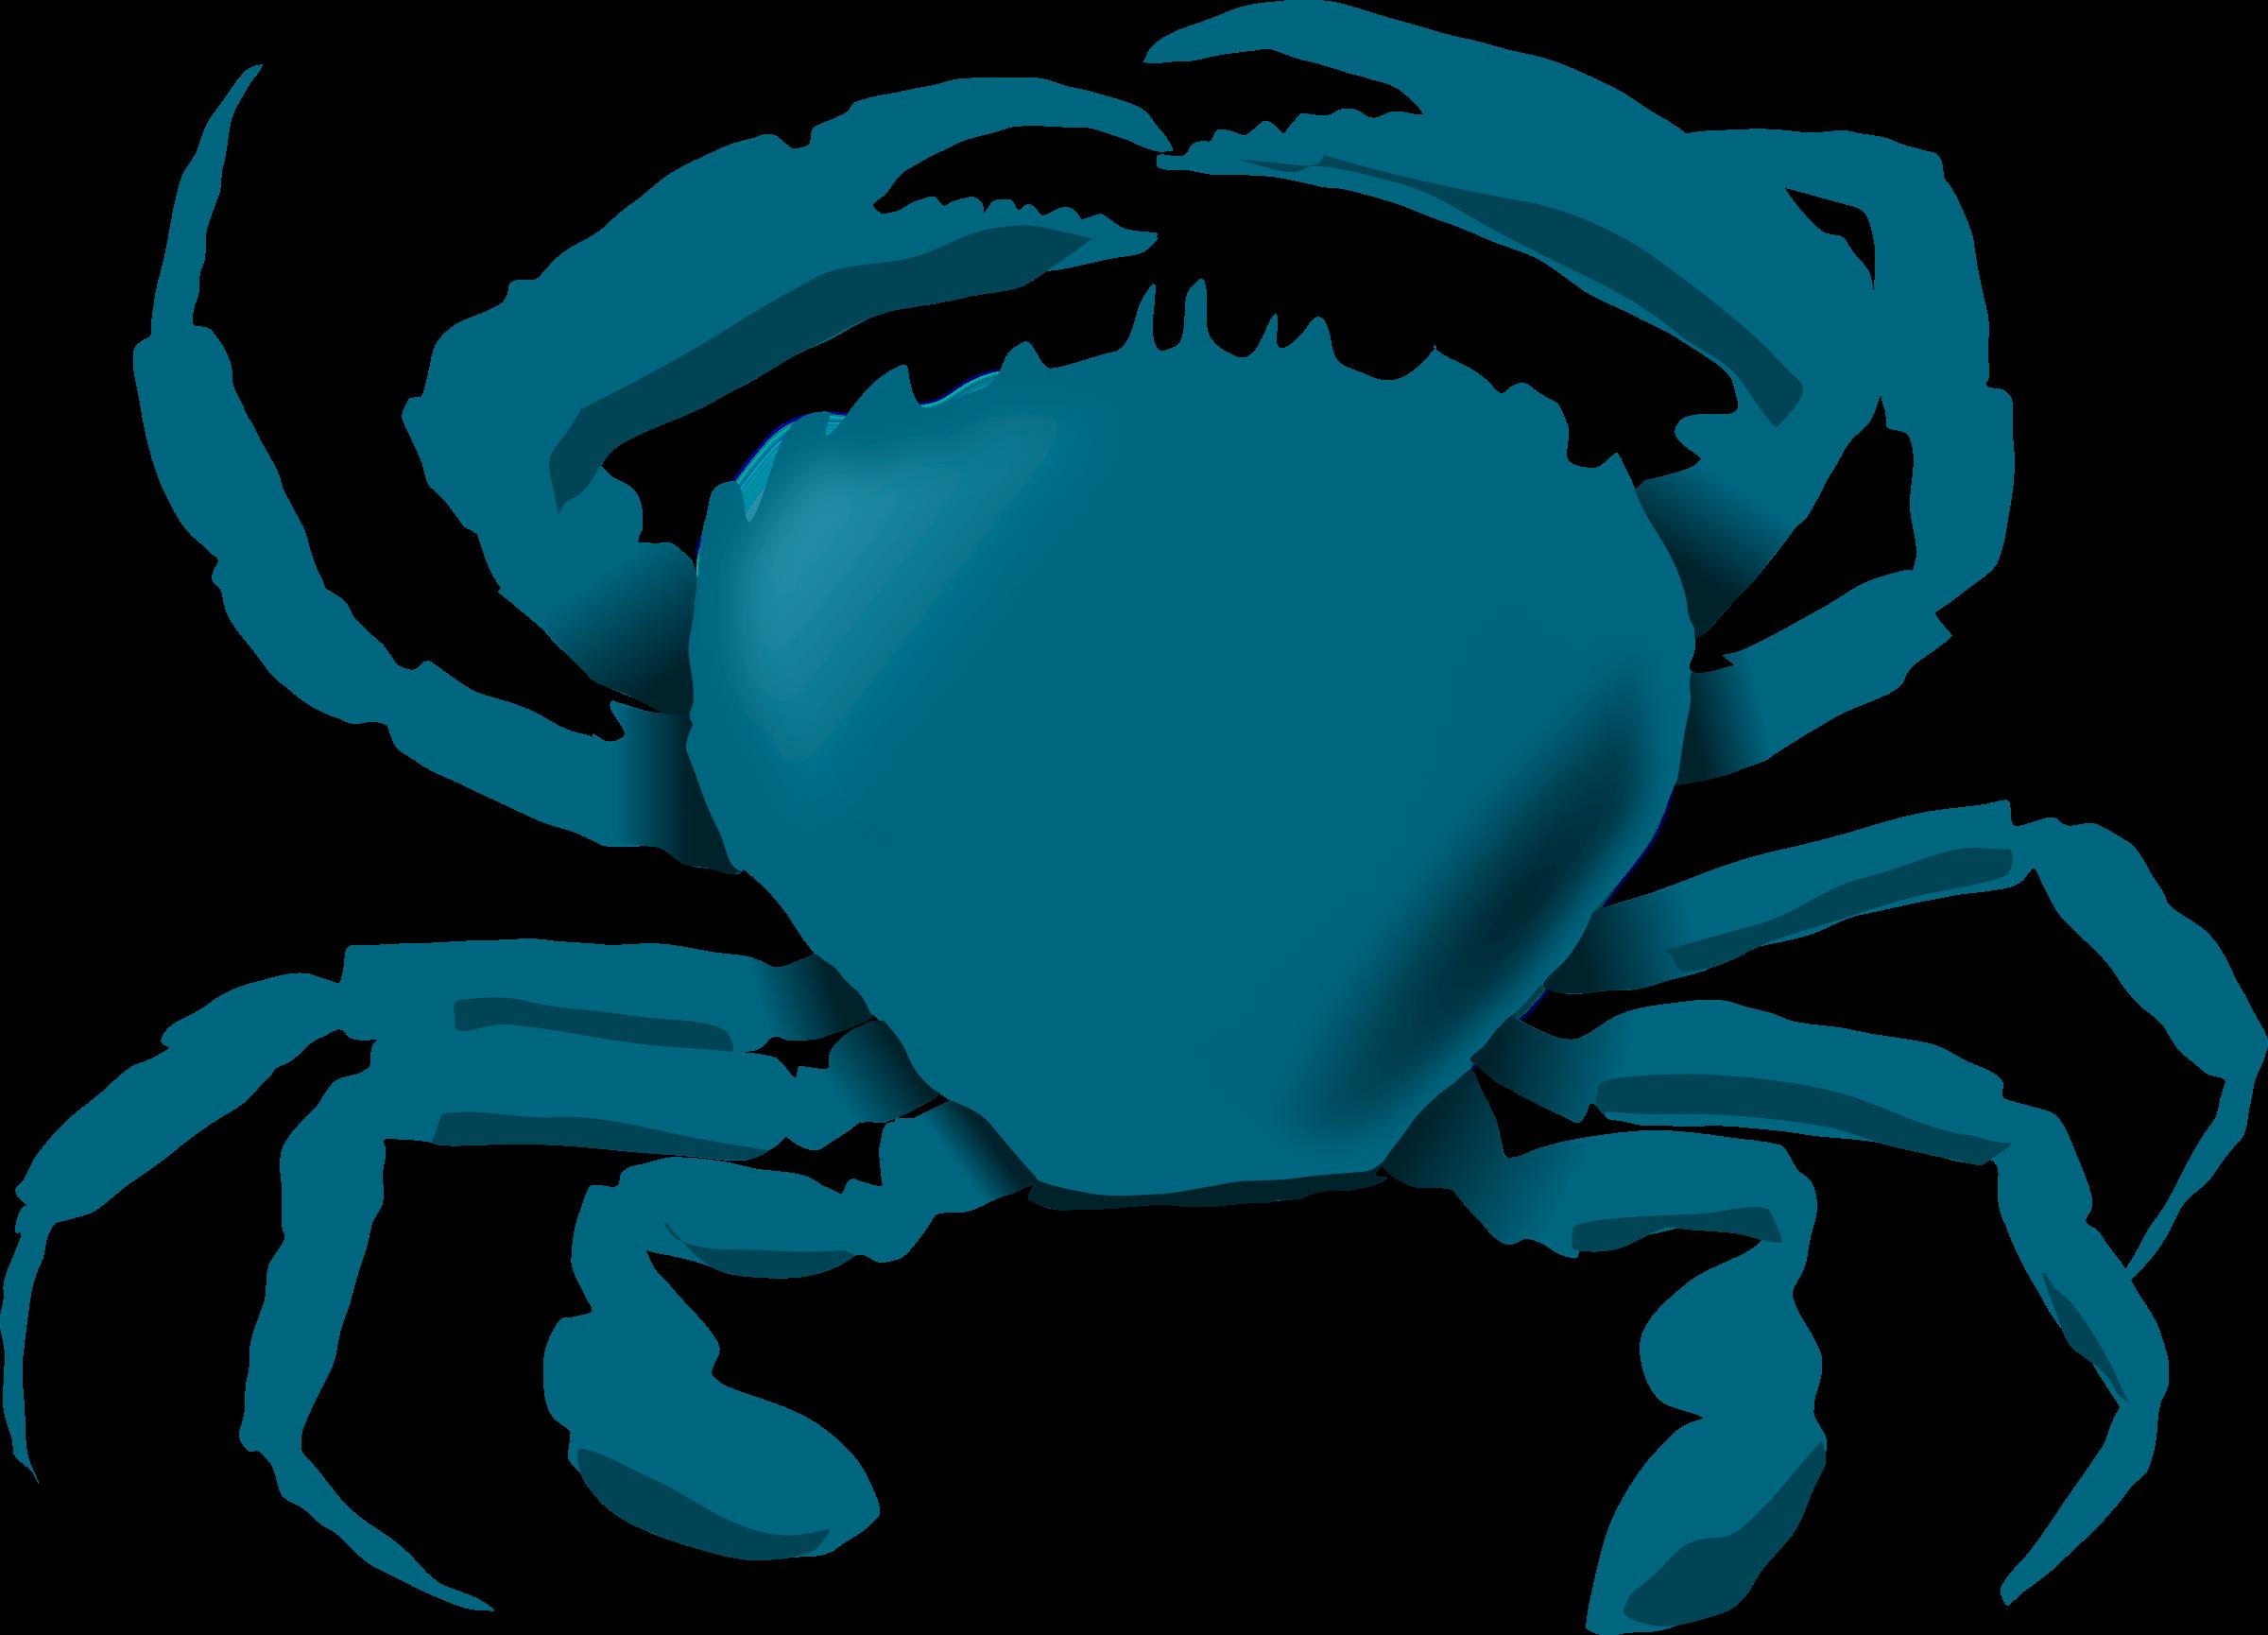 Blue big image png. Crab clipart red crab